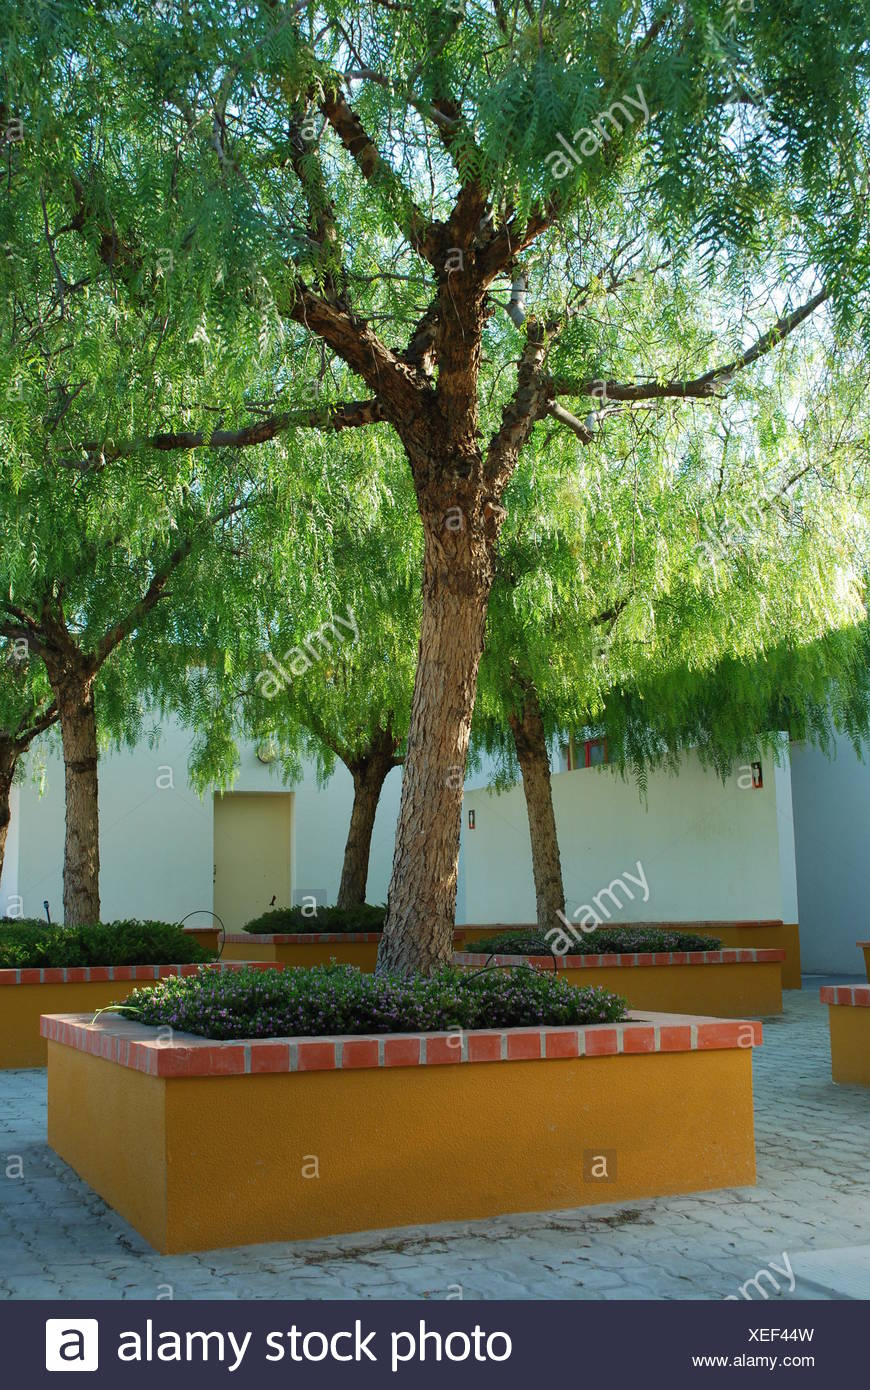 Tree Flora Orange Lawn Green Beauty Nature Natural Beautiful Beauteously Nice Stock Photo 284303625 Alamy